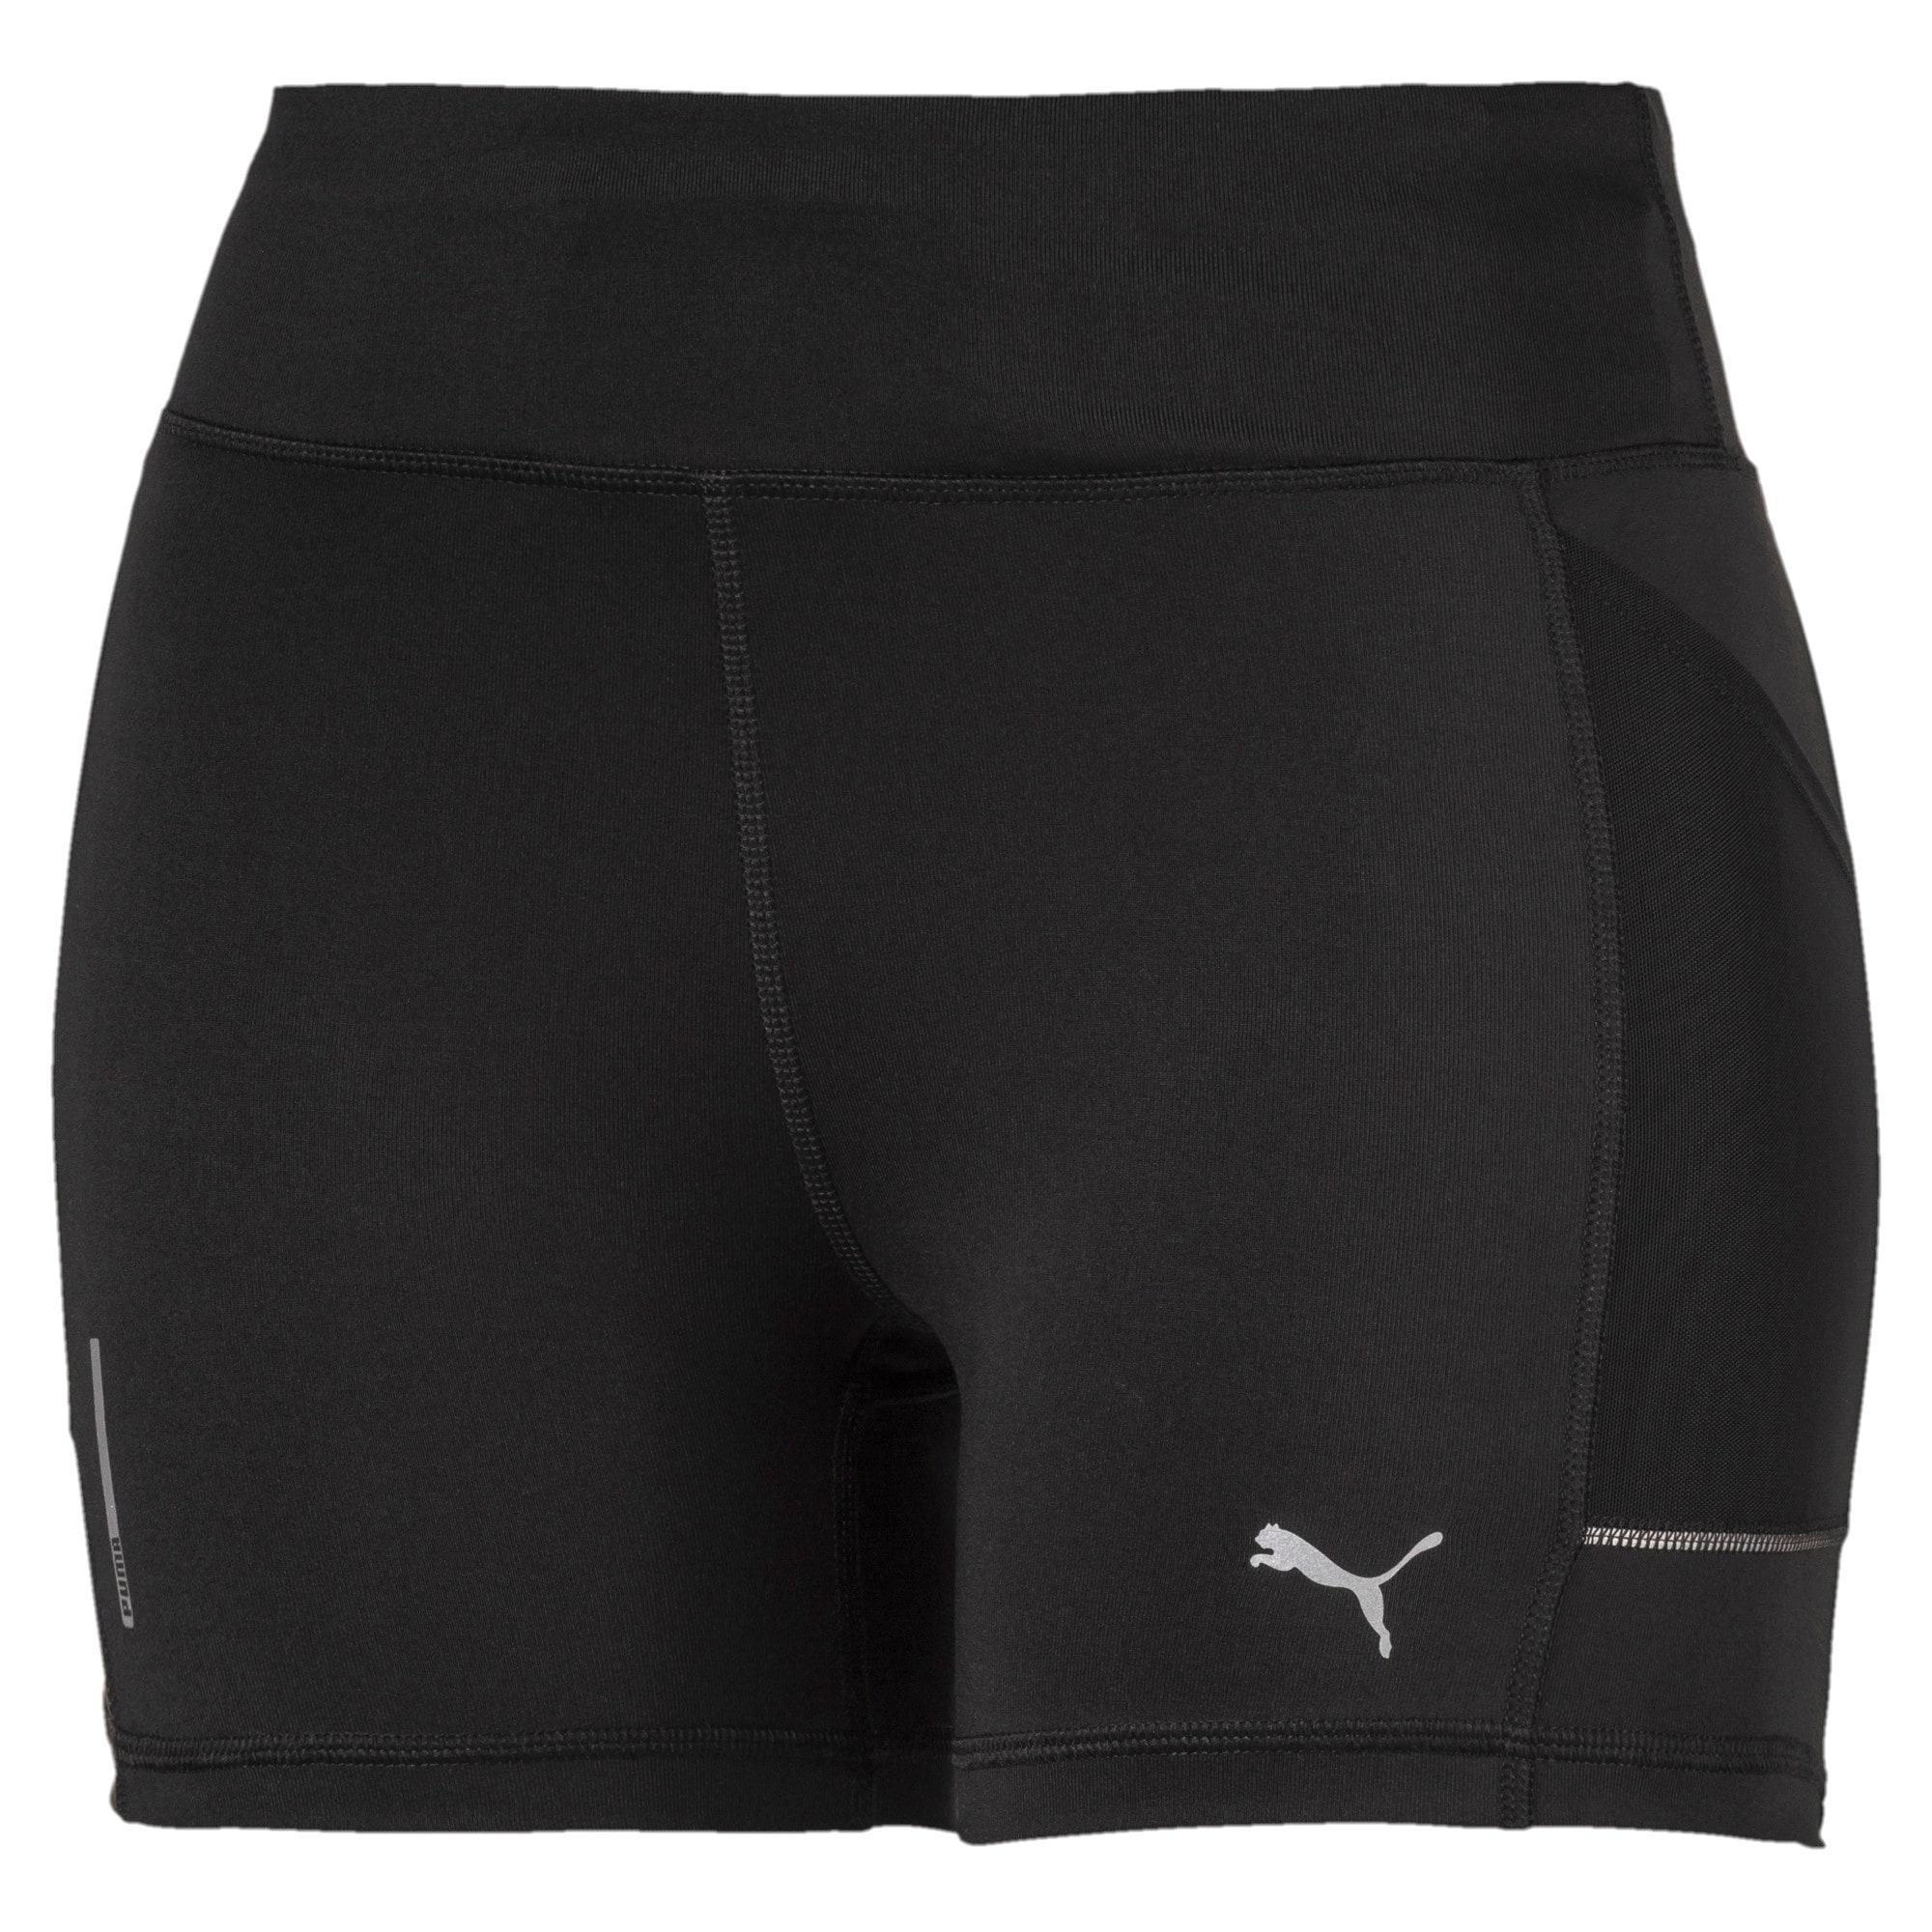 Miniatura 4 de Calzas cortas Ignite para mujer, Puma Black, mediano